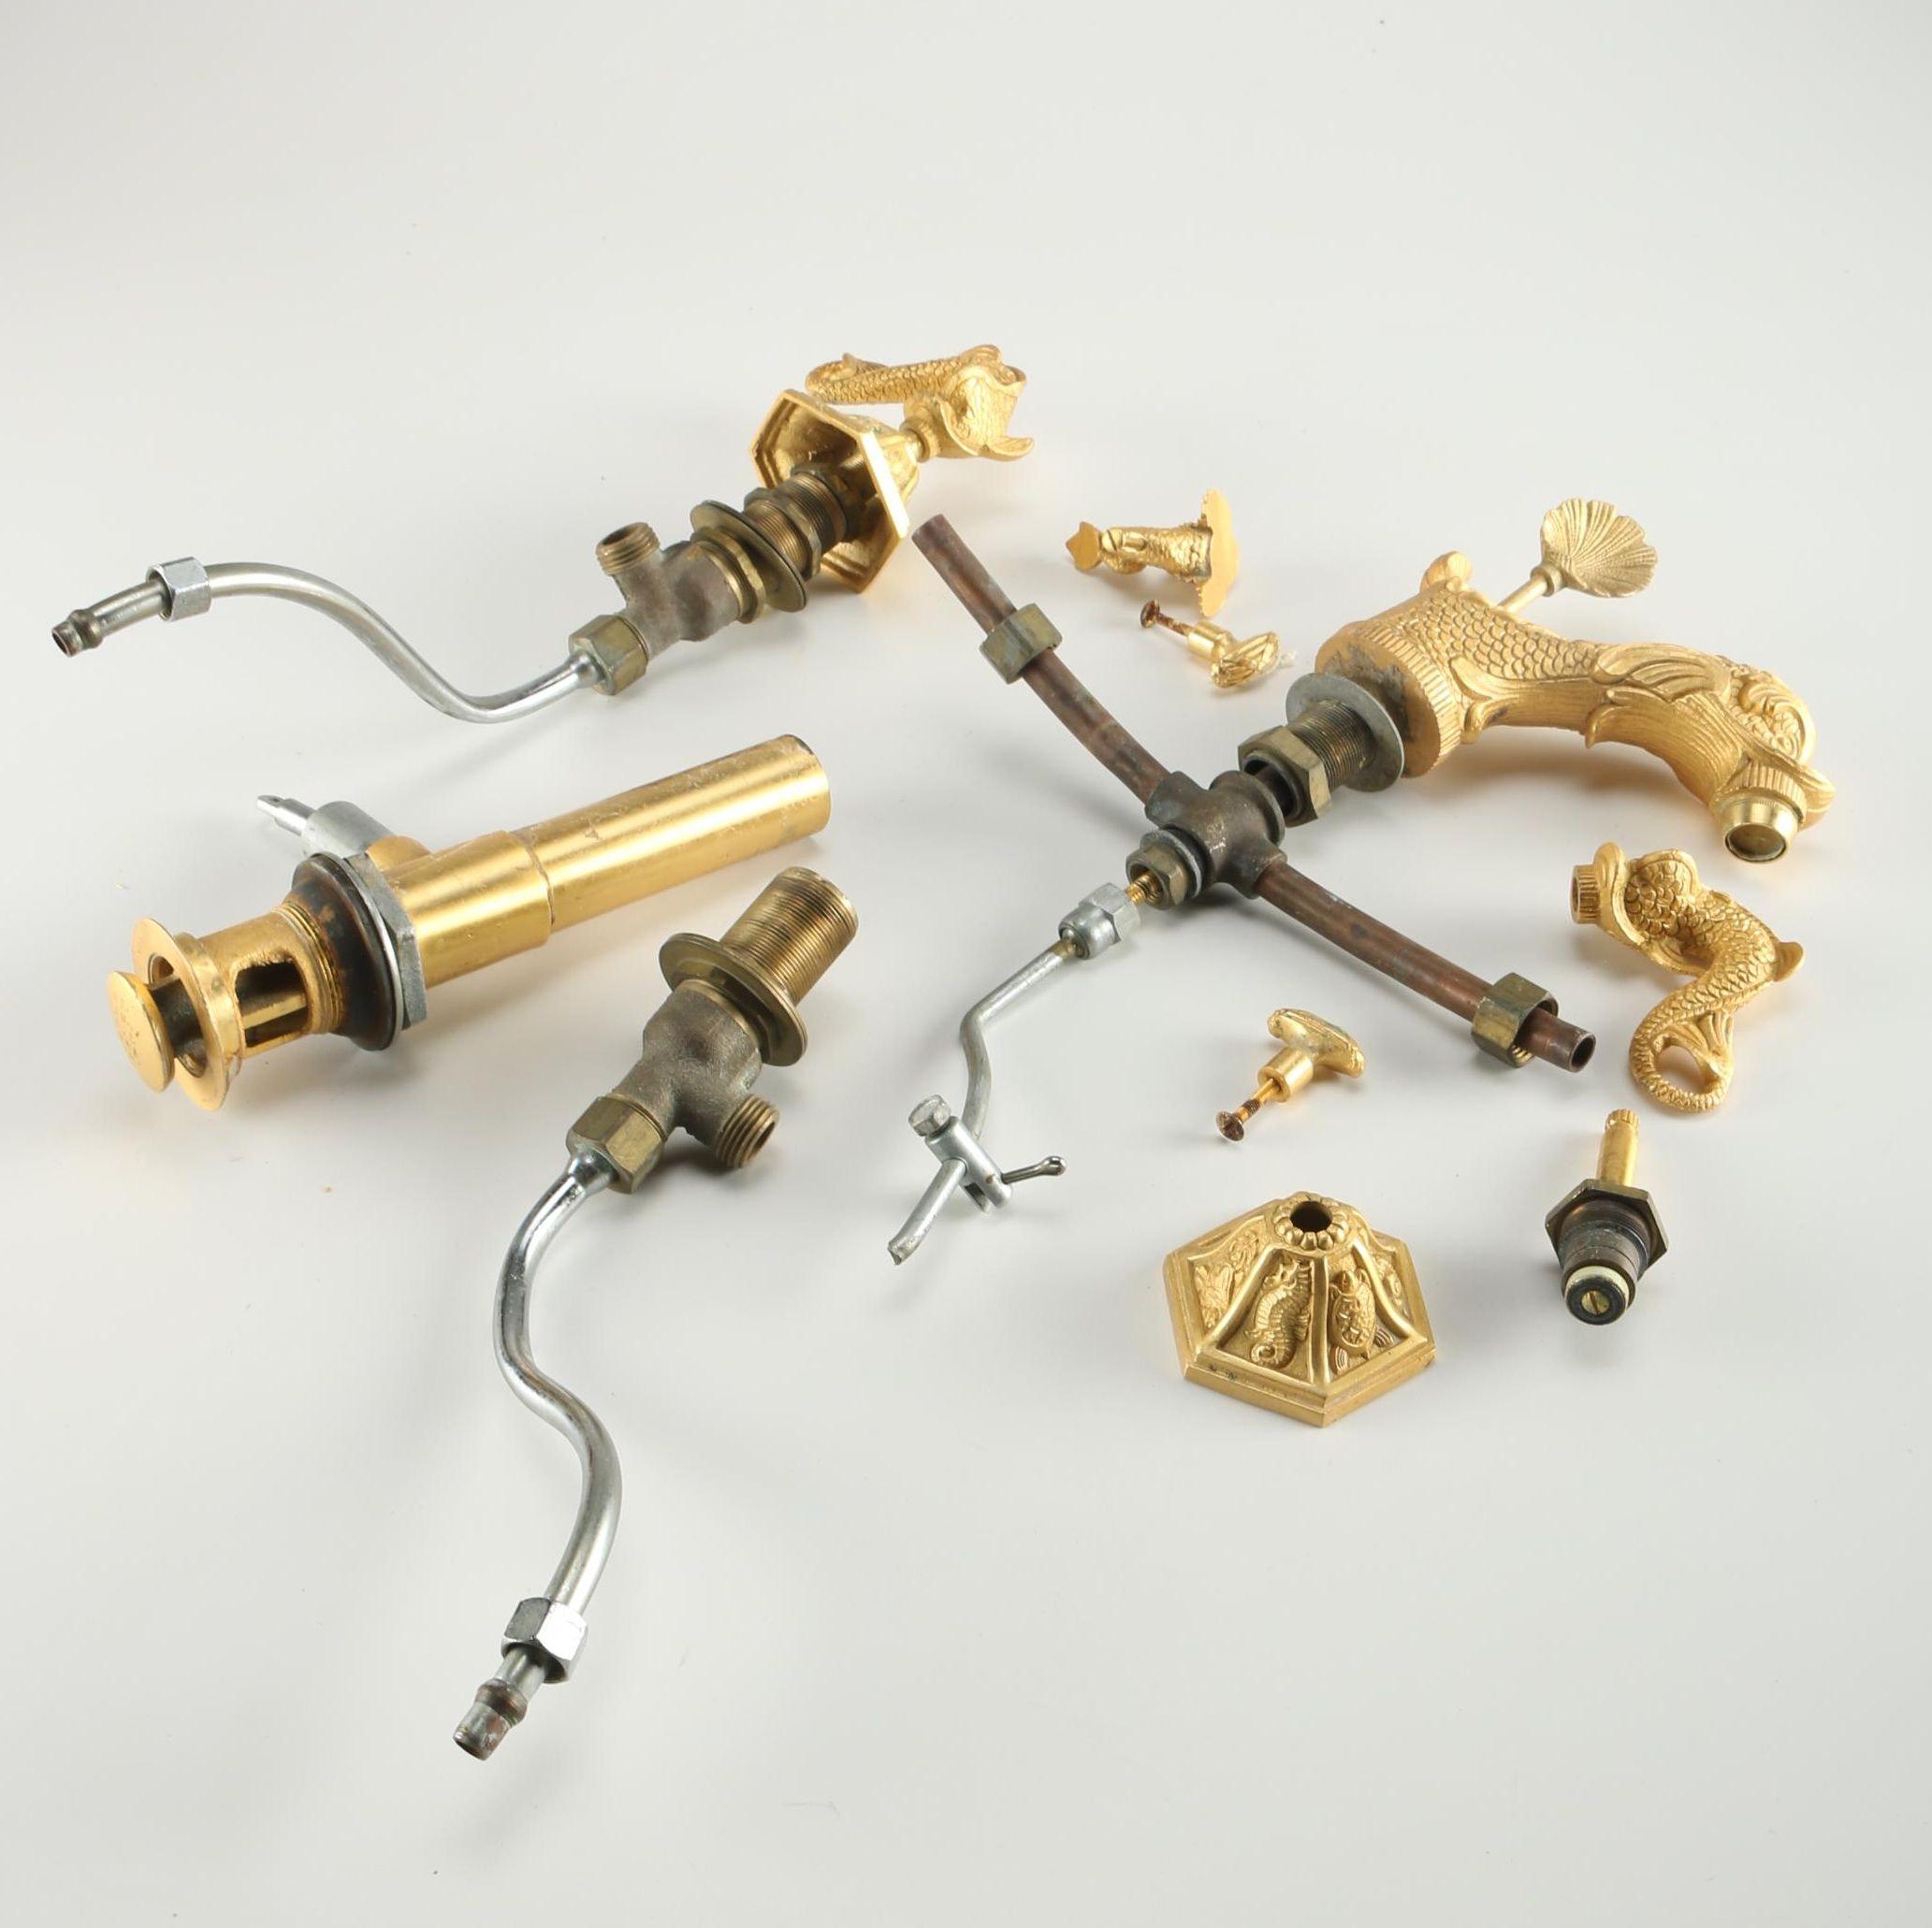 Three Piece Gold Tone and Brass Bathroom Faucet EBTH